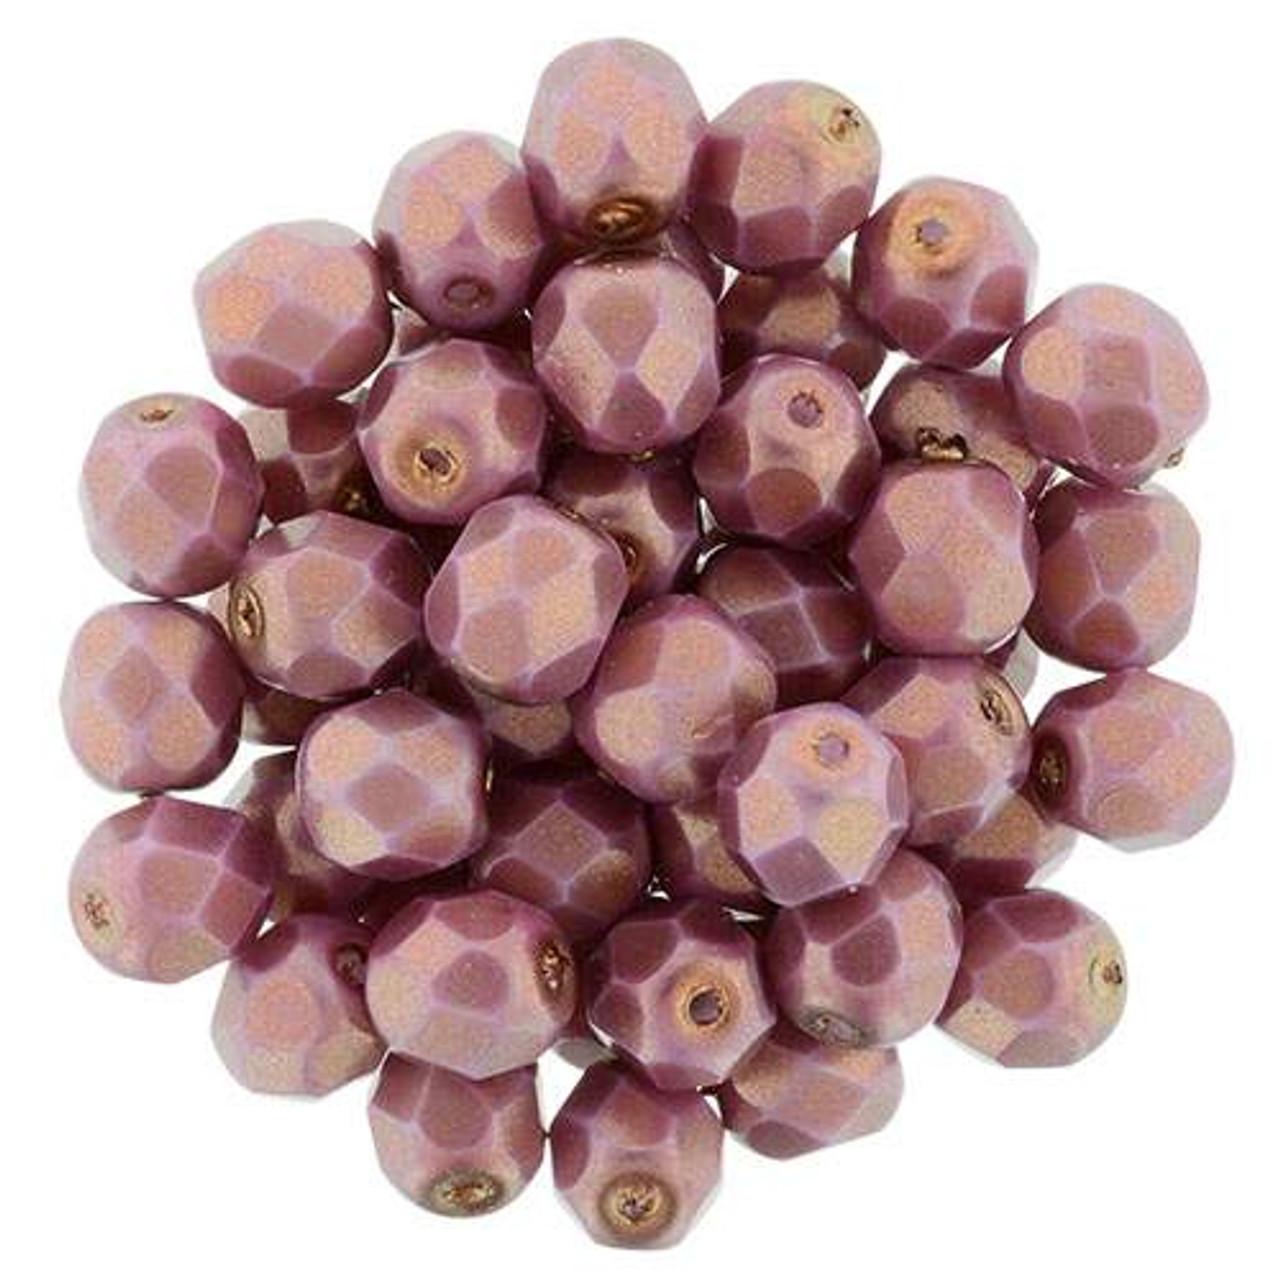 25 6 mm Czech Glass Firepolish Beads Stone Pink Luster